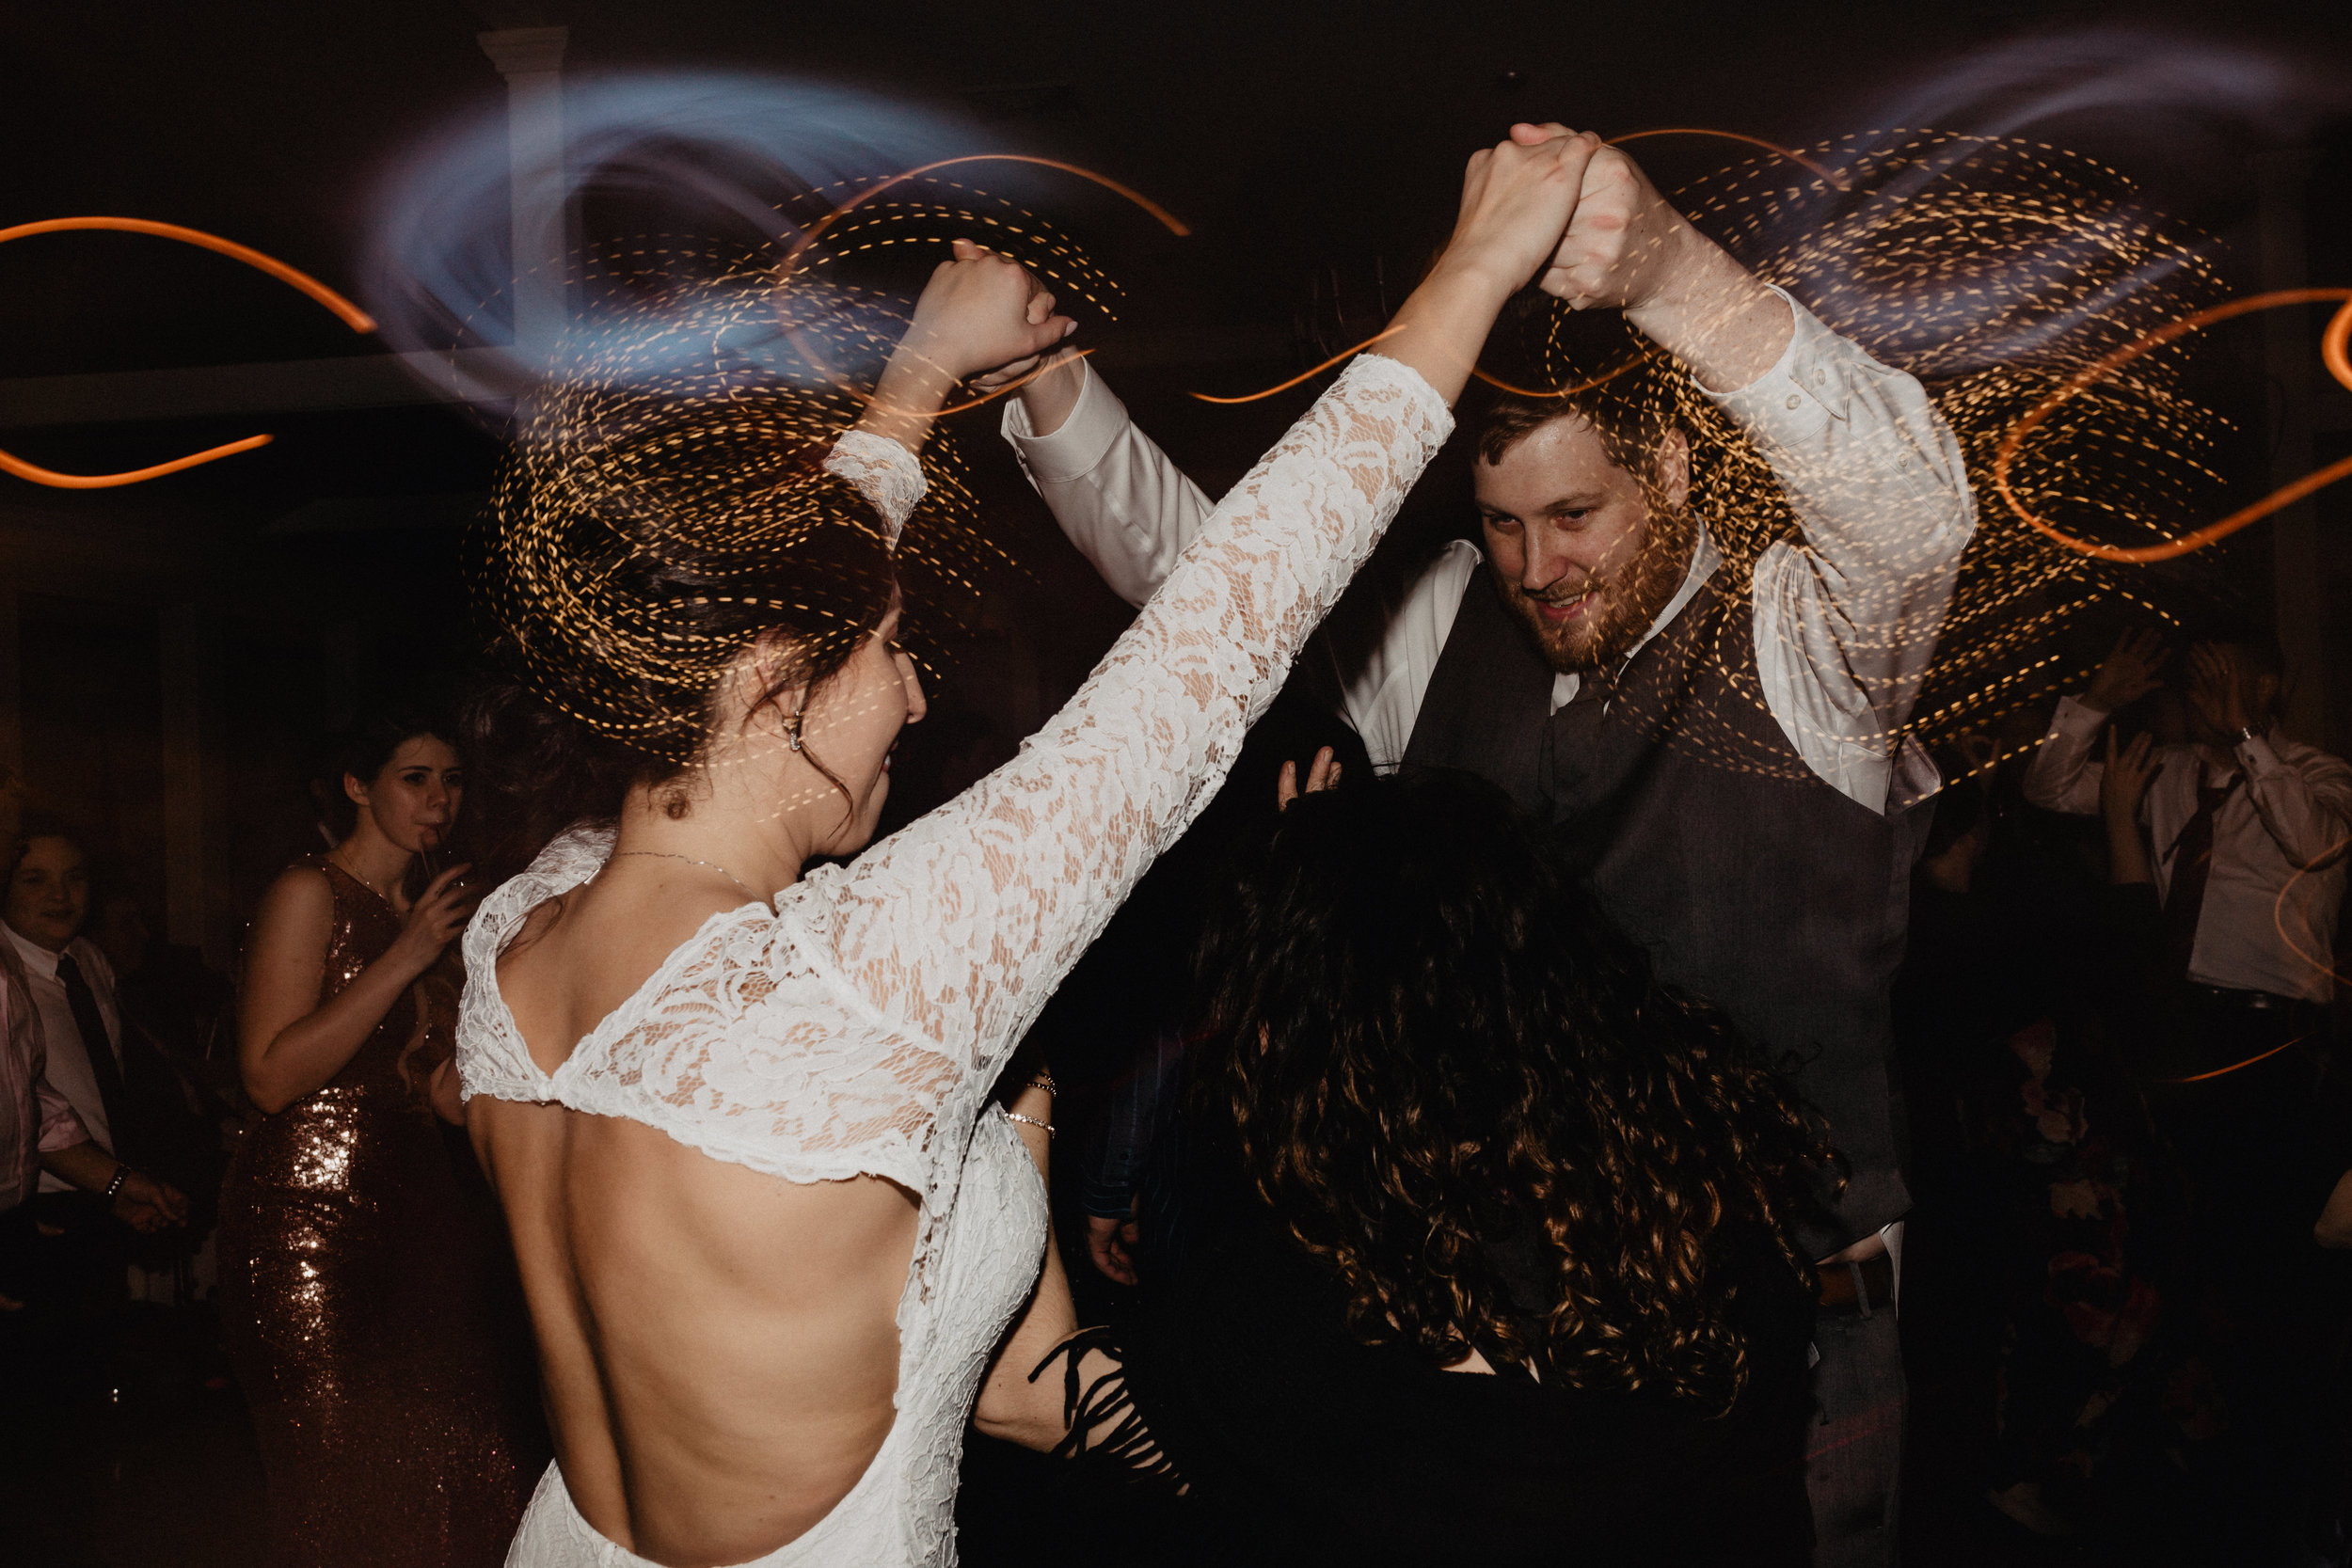 old_daley_on_crooked_lake_wedding_101.jpg